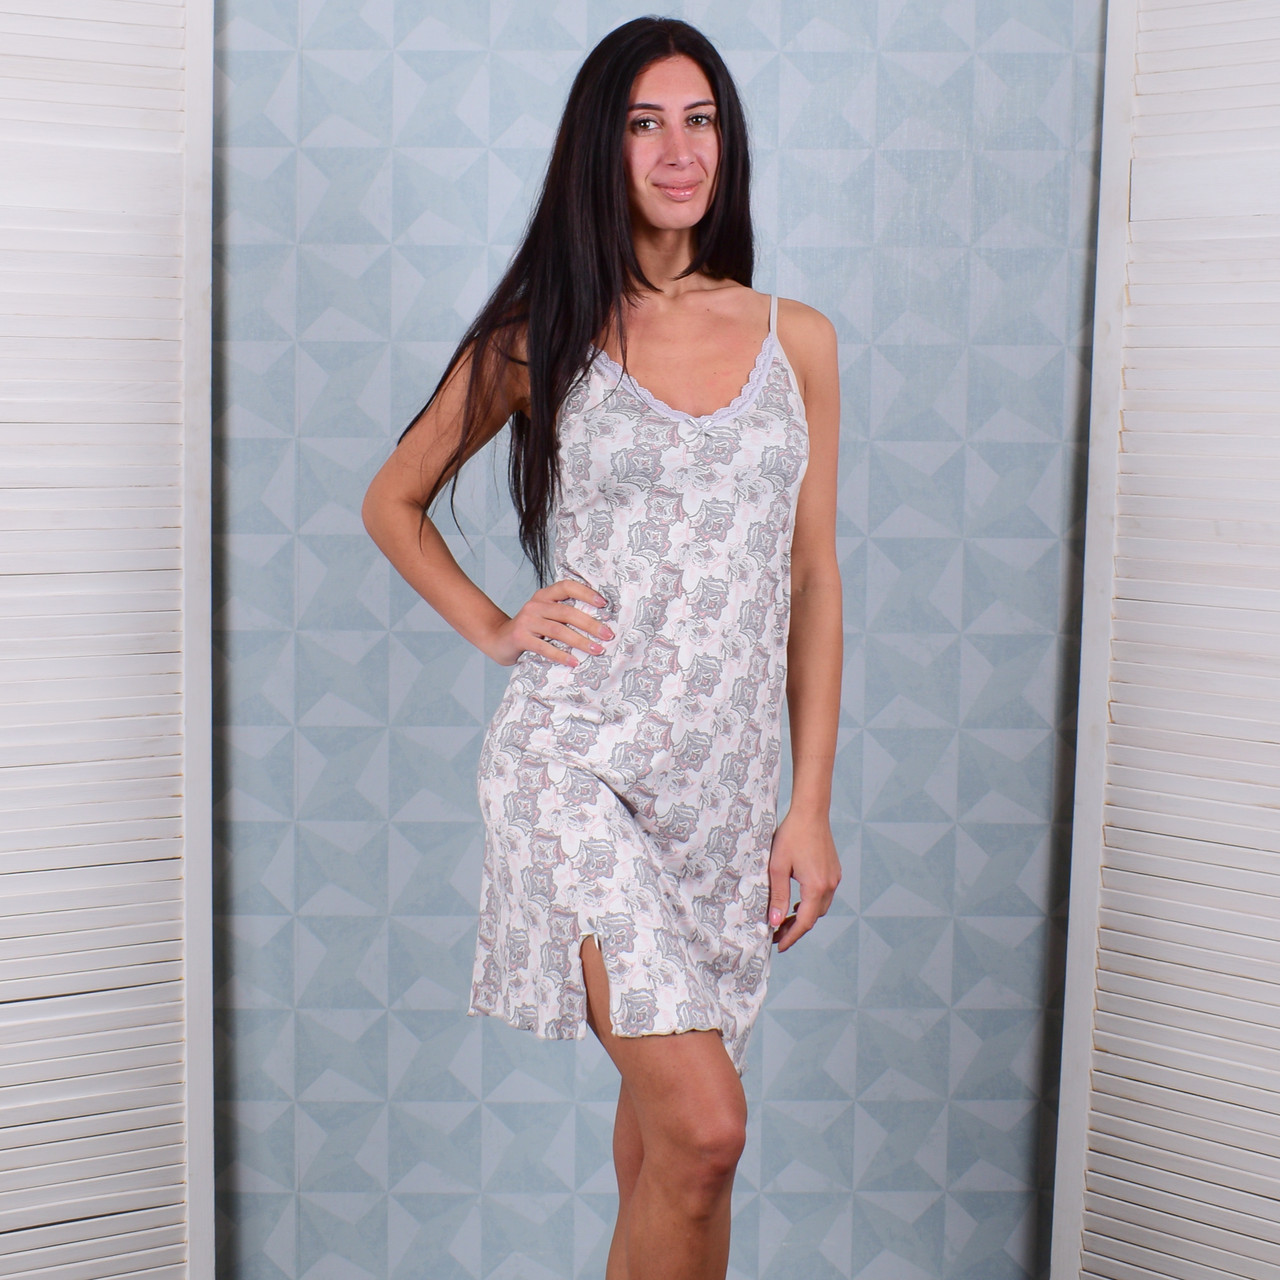 6819958393e Женская ночная рубашка Турция Pink Secret 4688 XXL. Размер 50-52 ...